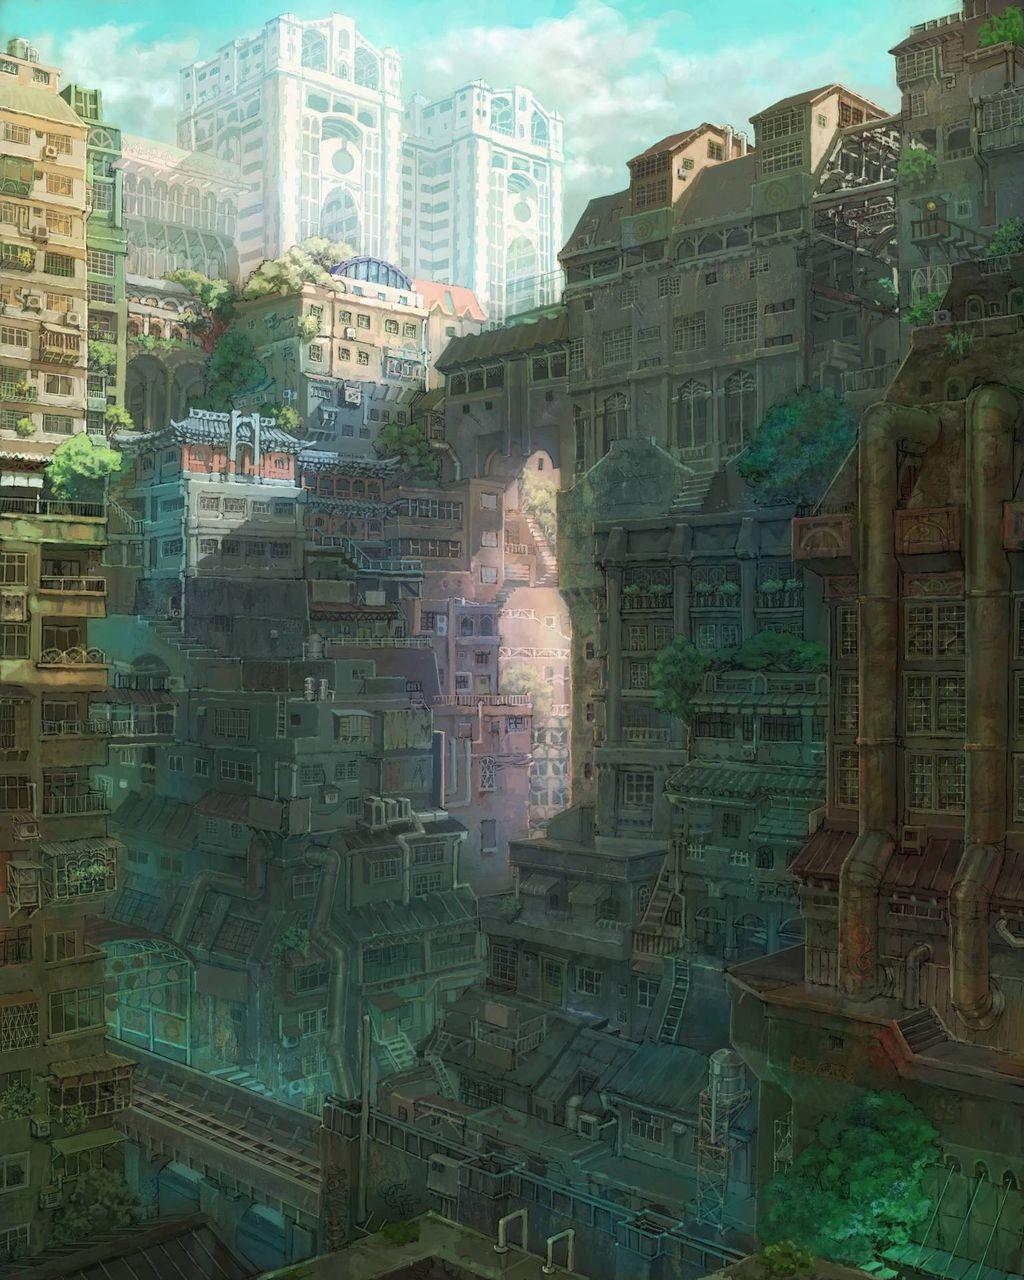 http://livedoor.blogimg.jp/xmatometestx/imgs/f/d/fdff1404.jpg